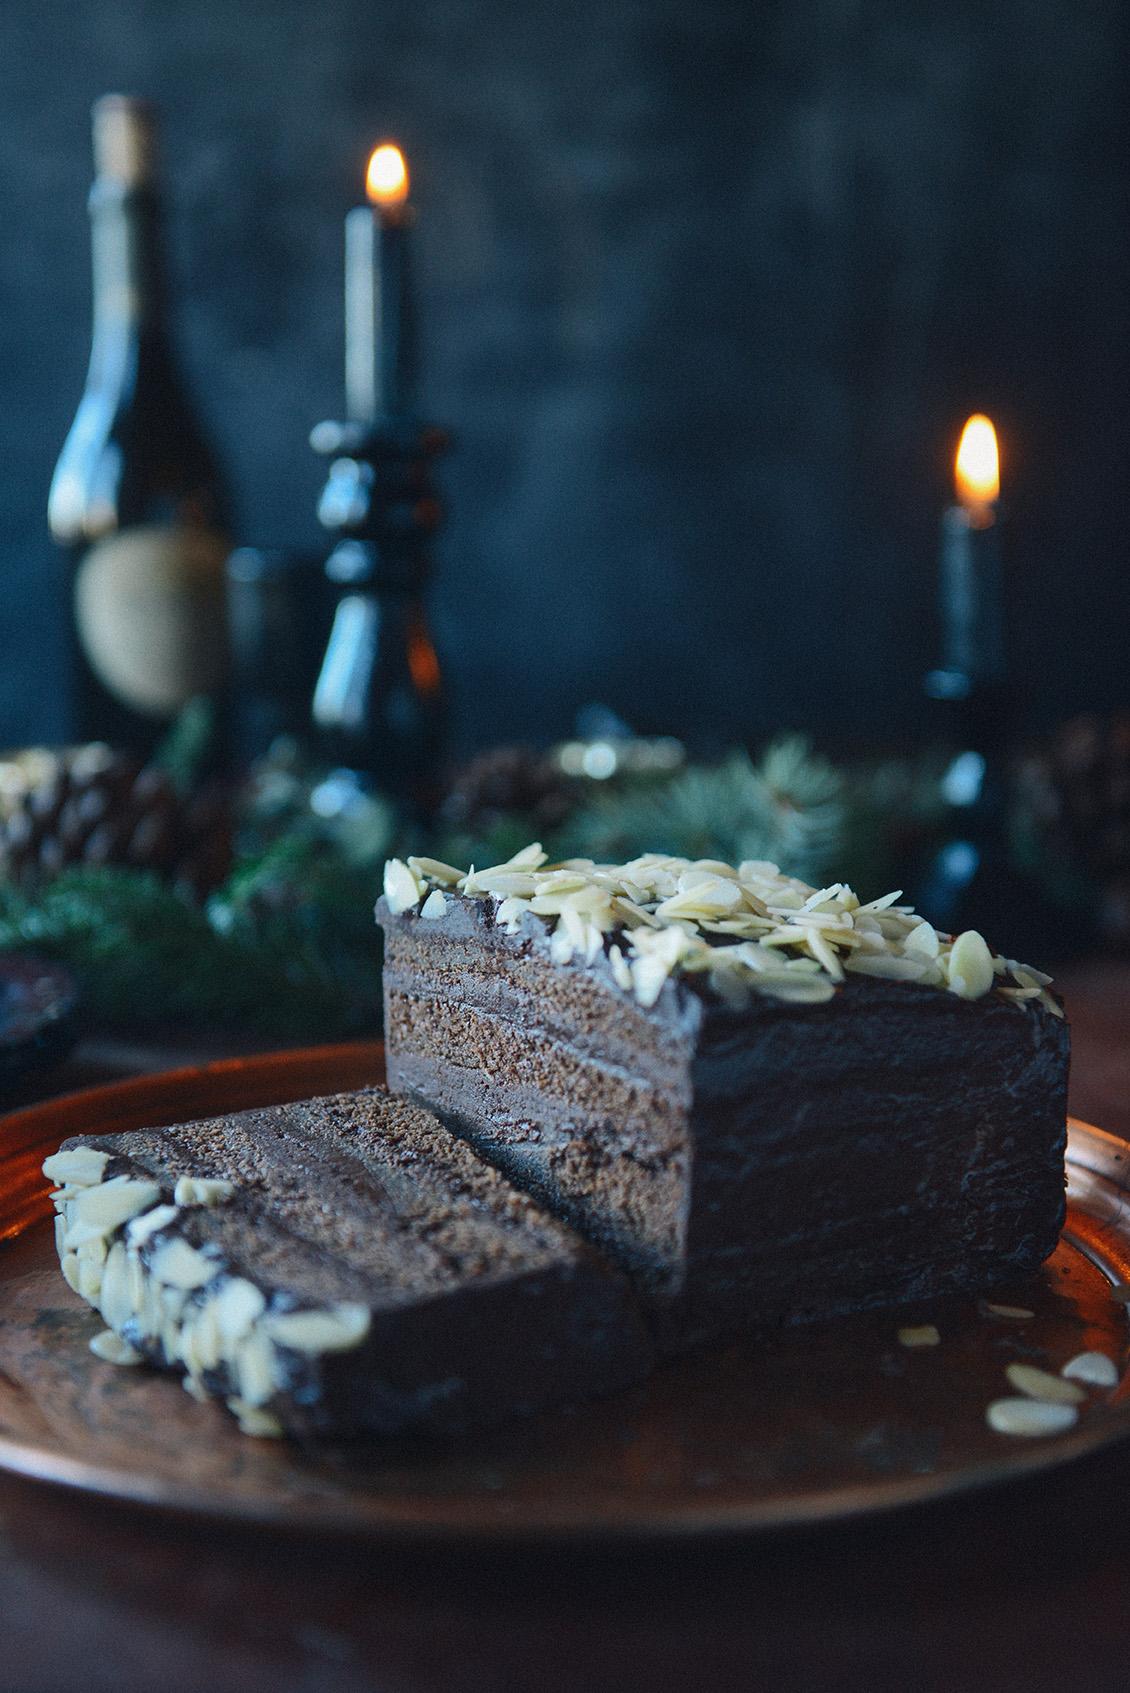 Whole Wheat Chocolate Layer Cake with Chestnut Cream & Dark Chocolate Ganache